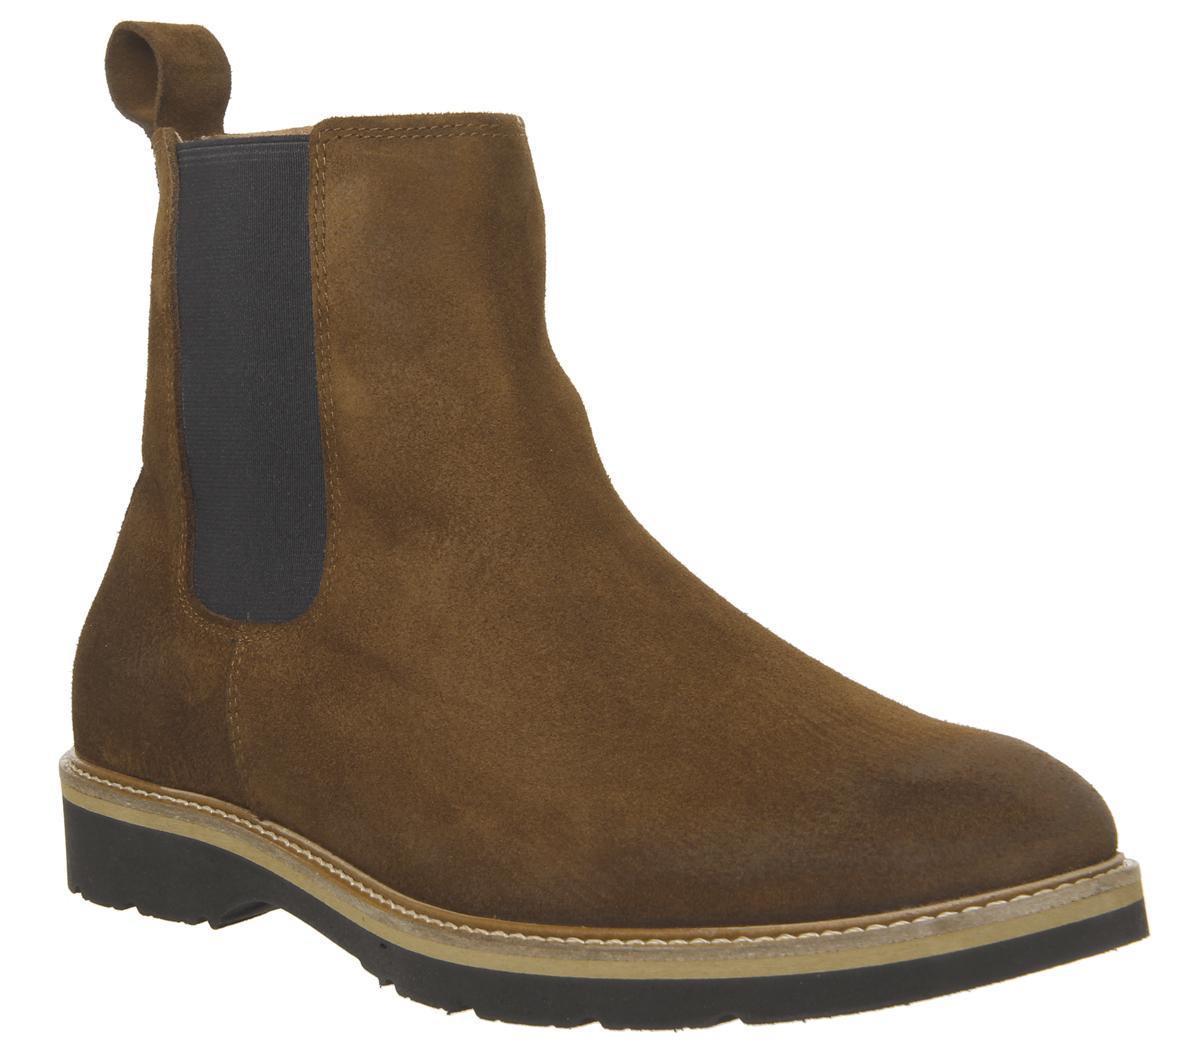 Igloo Chelsea Boots